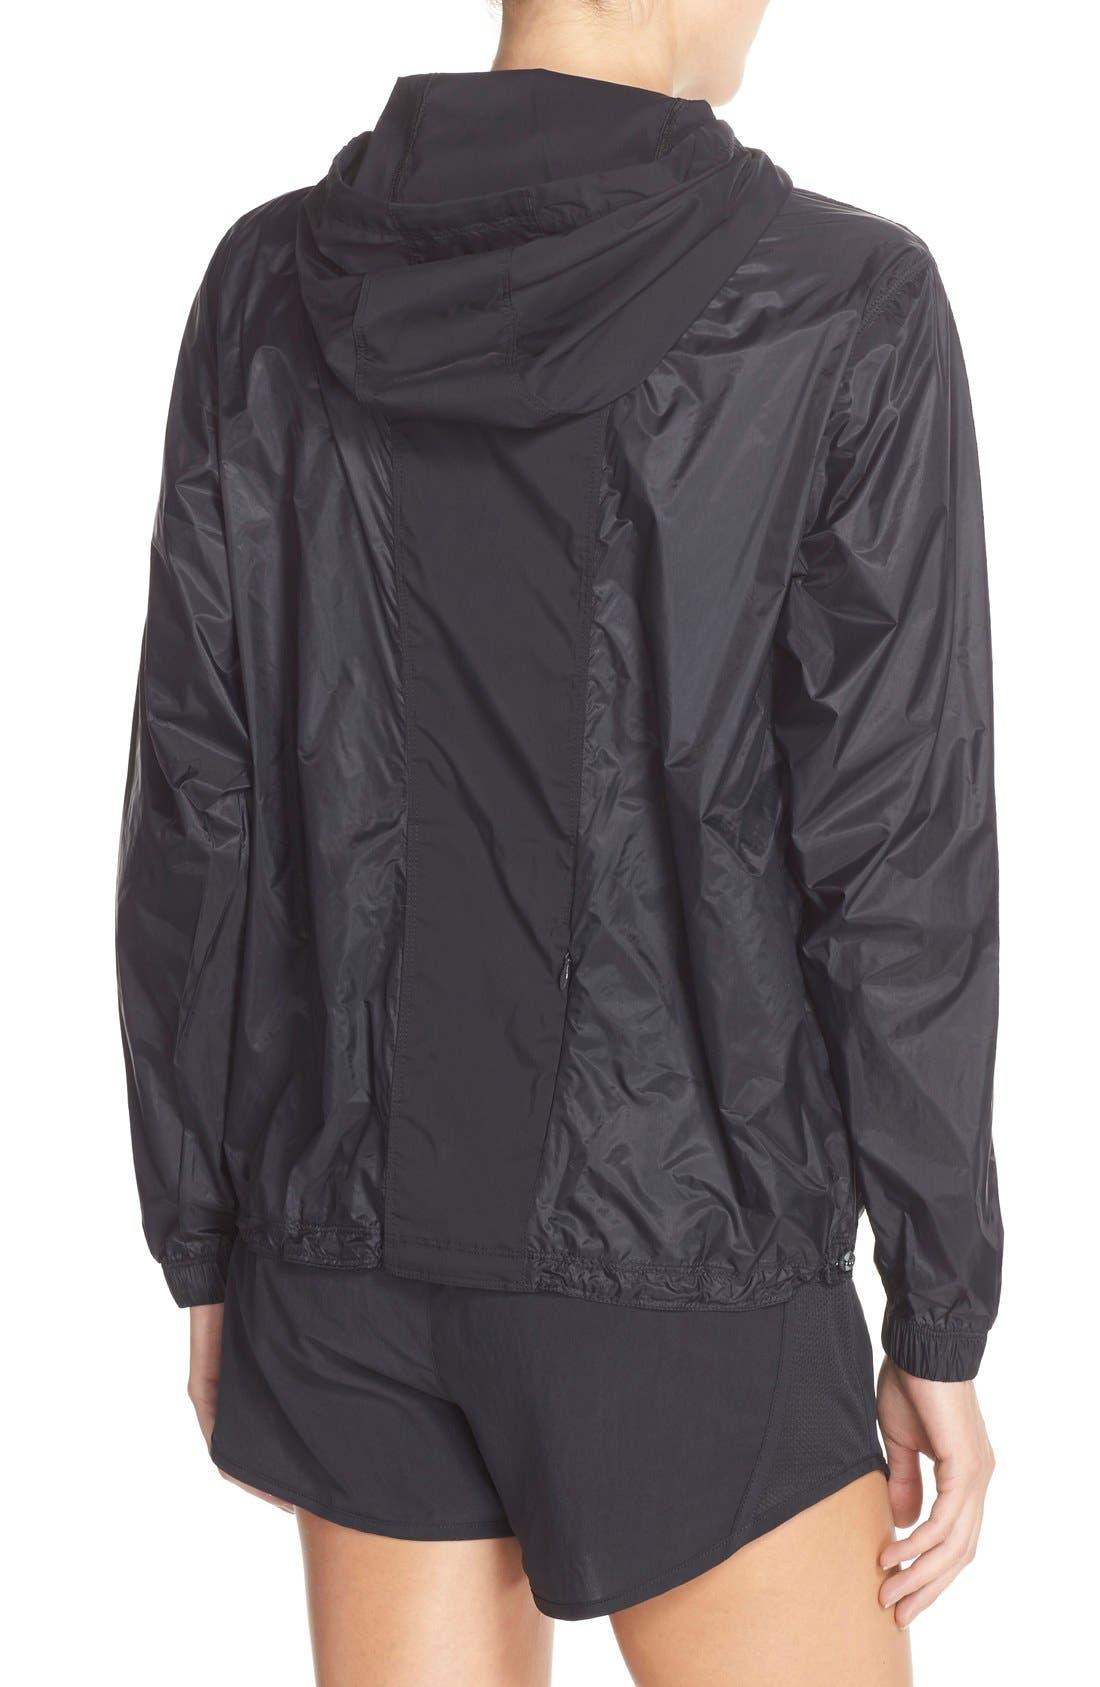 Alternate Image 2  - Under Armour 'Roga' Half Zip Jacket